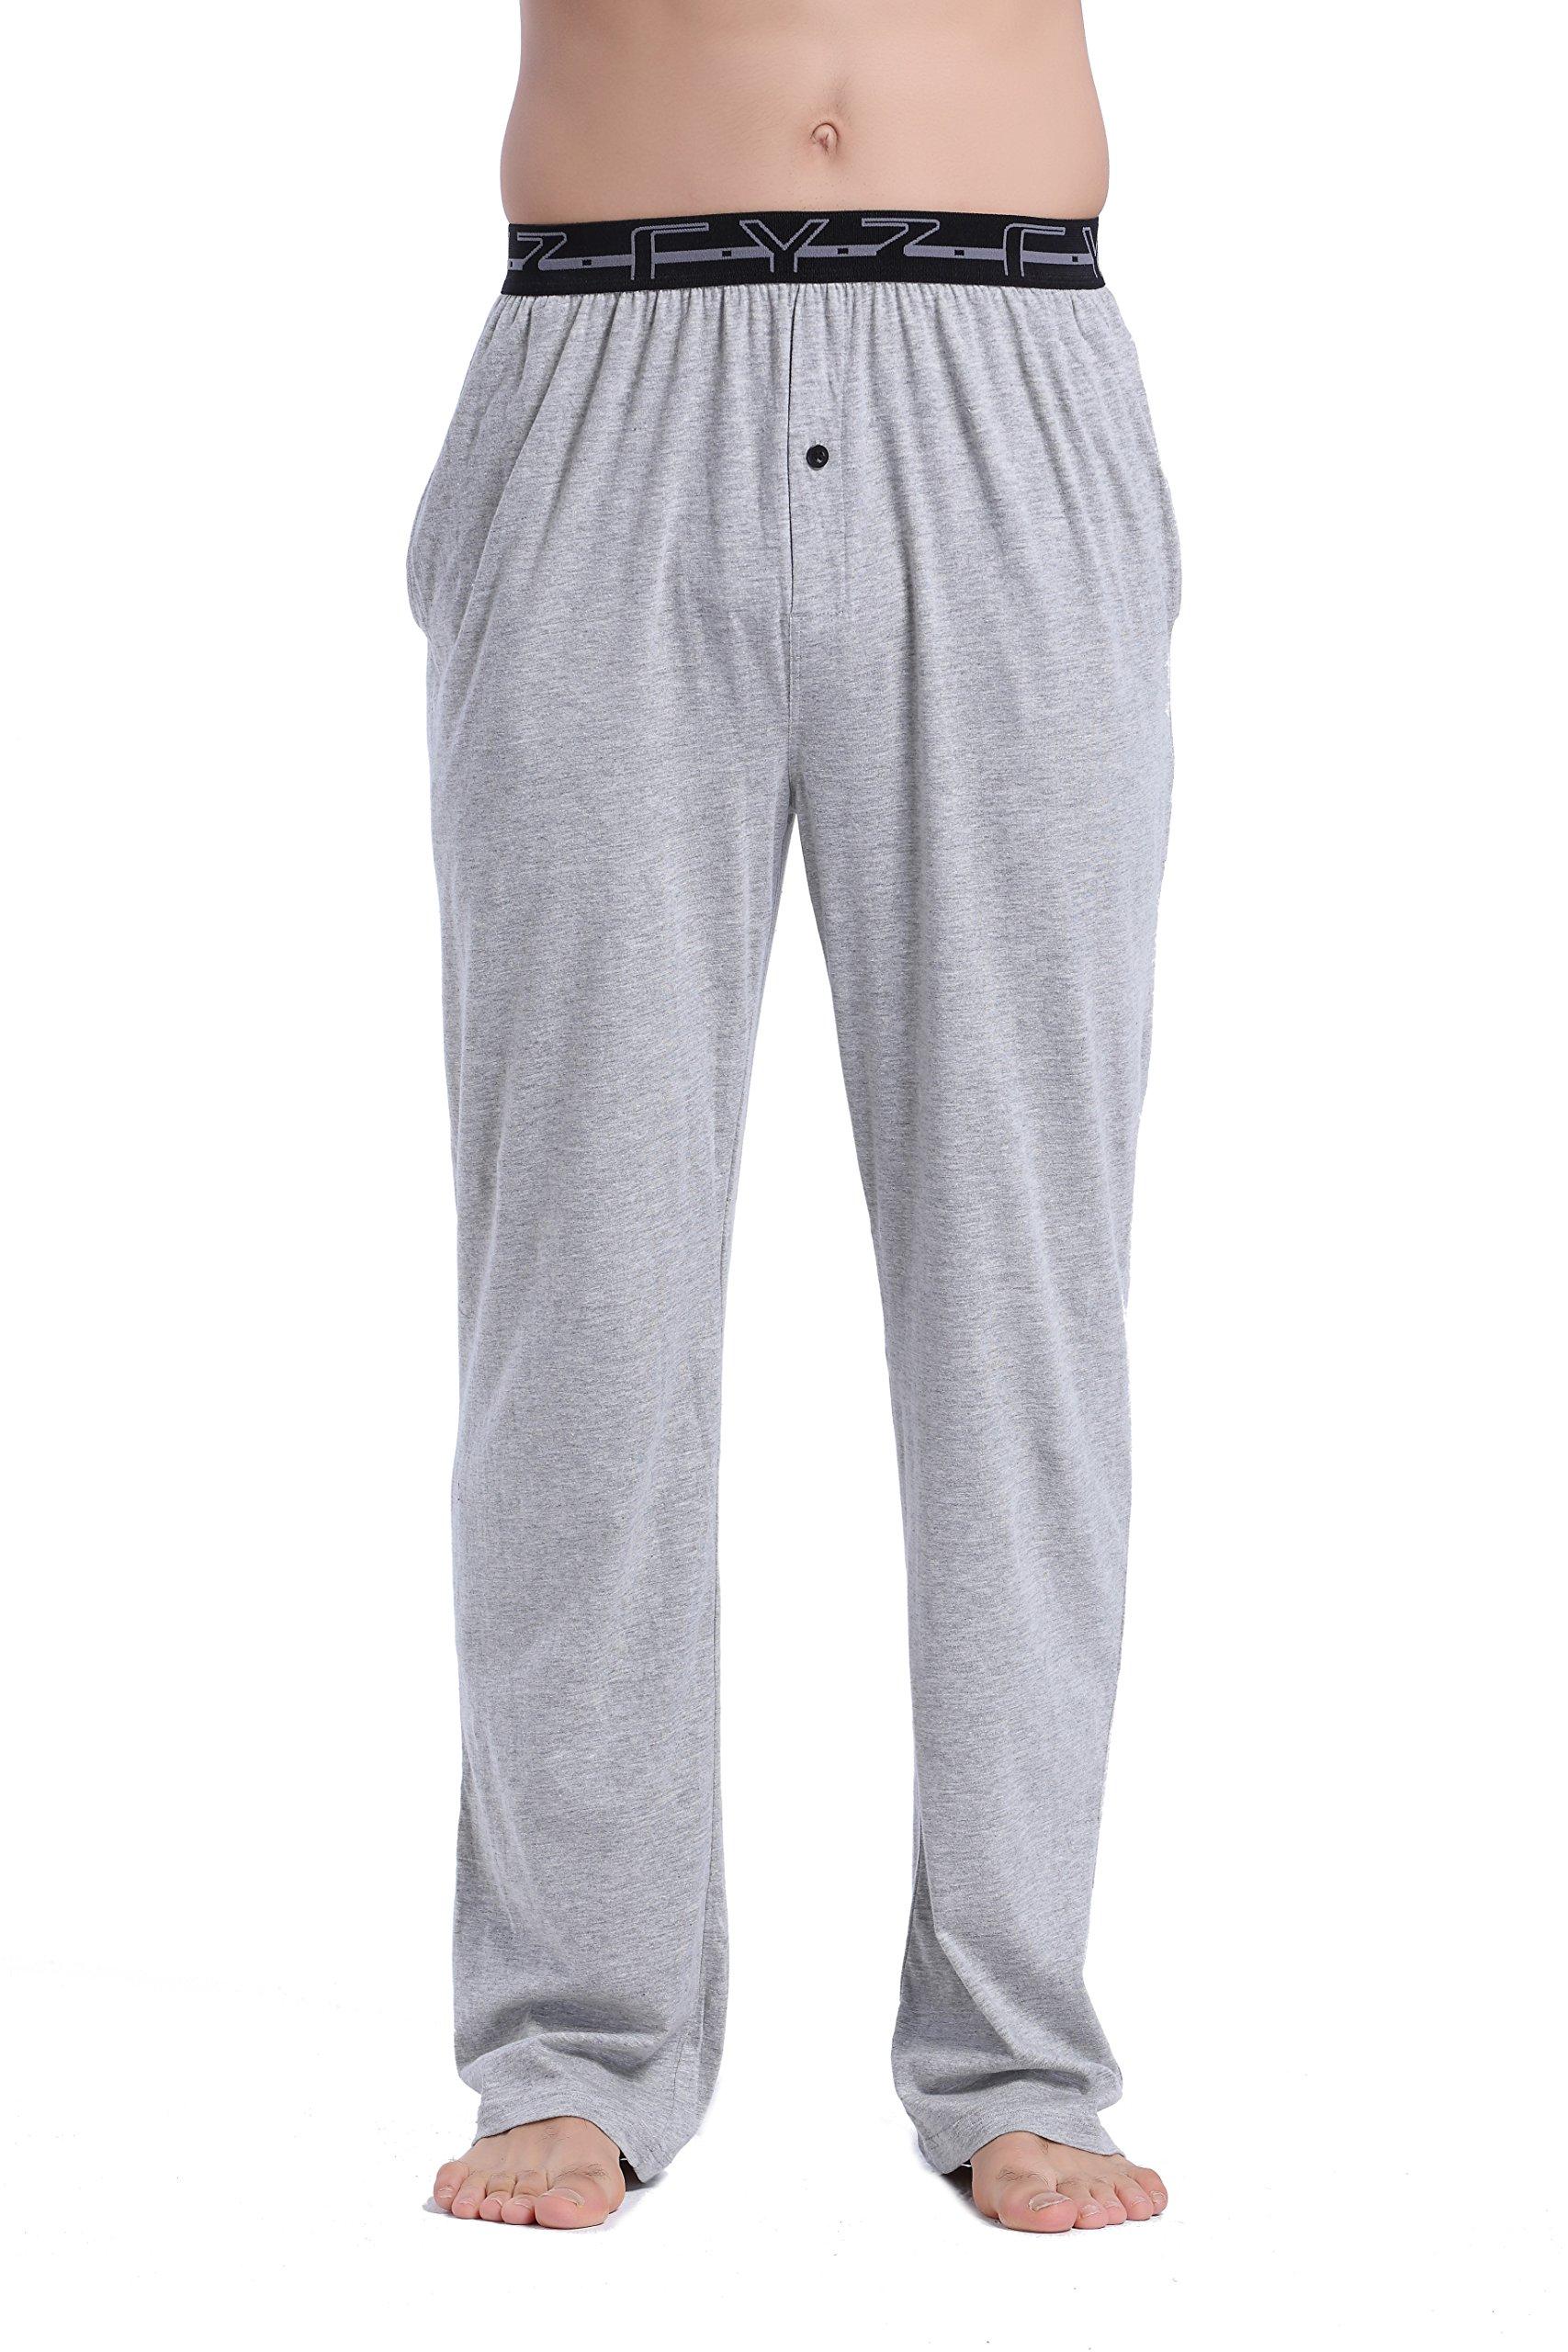 CYZ Men's 100% Cotton Jersey Knit Pajama Pants with Elastic Waistband-Greymelange-XL